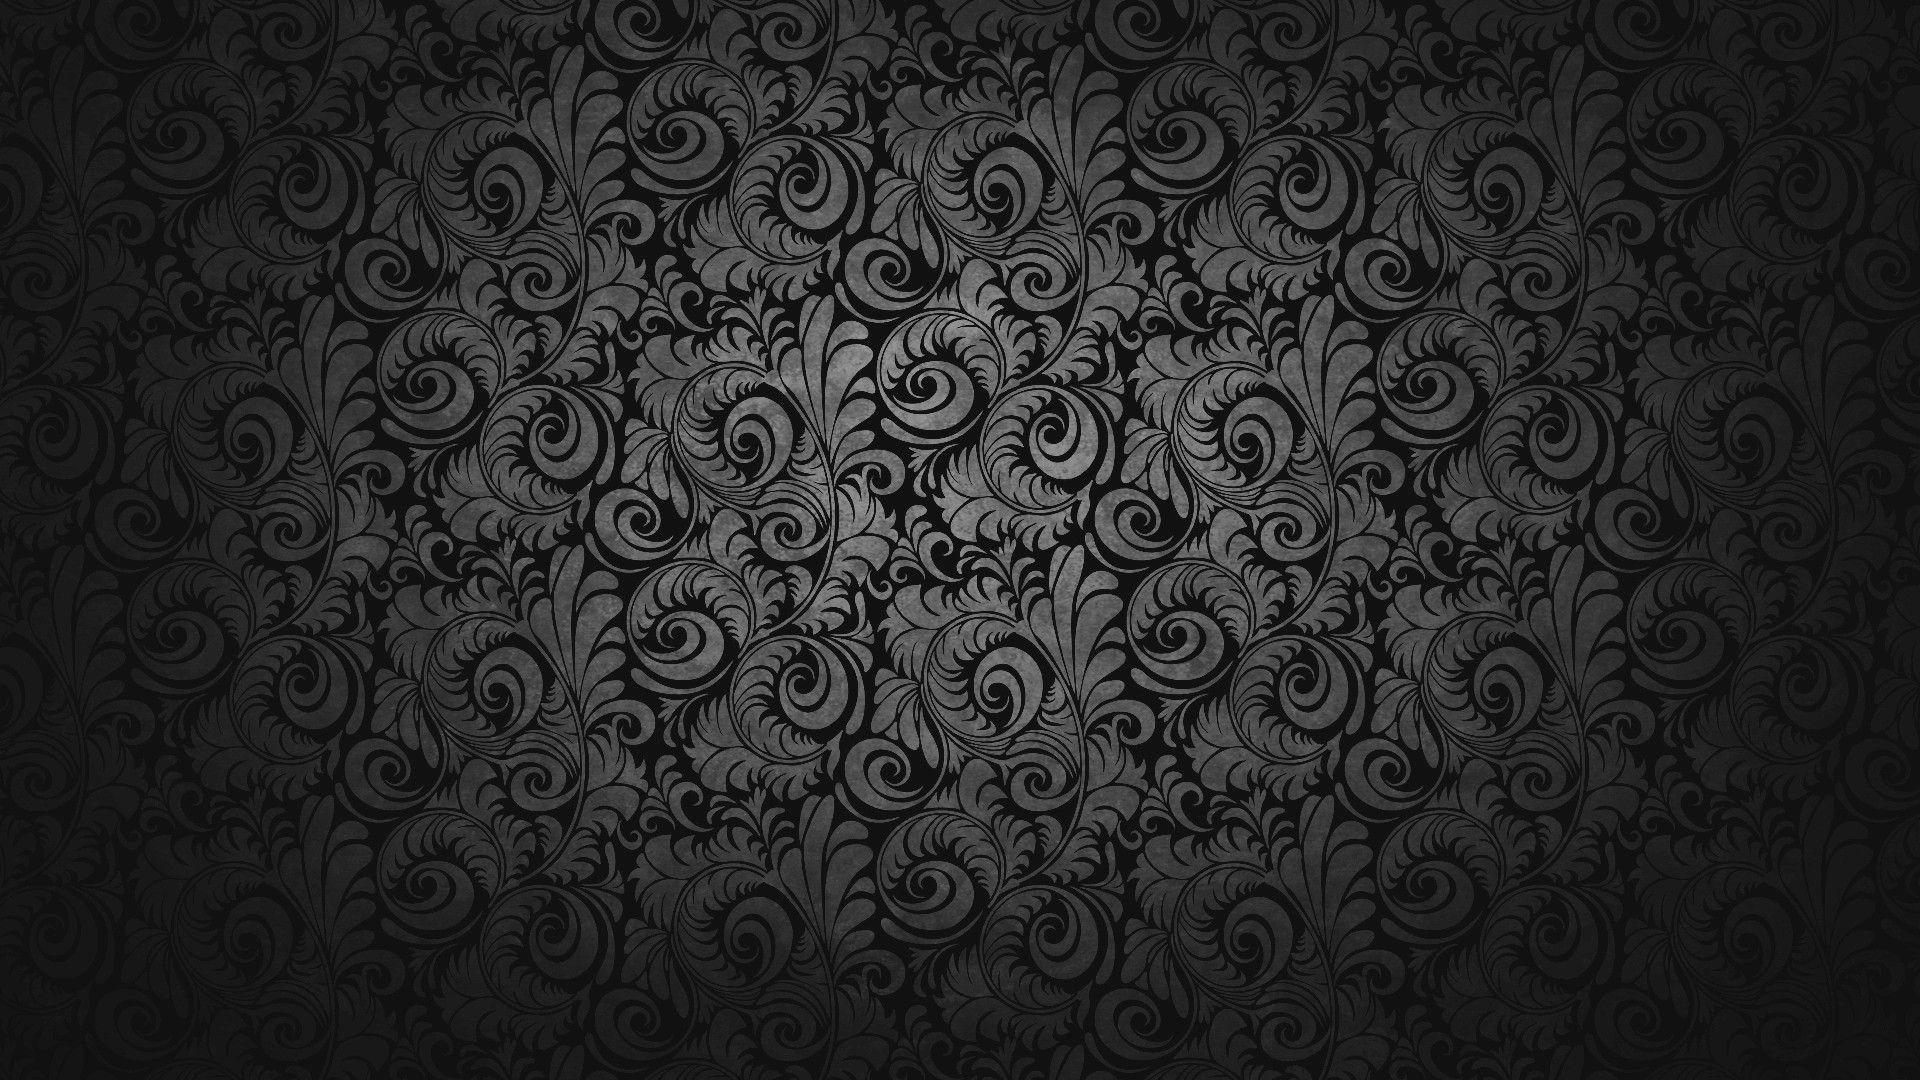 1920x1080 Psychedelic Computer Wallpapers Desktop Backgrounds